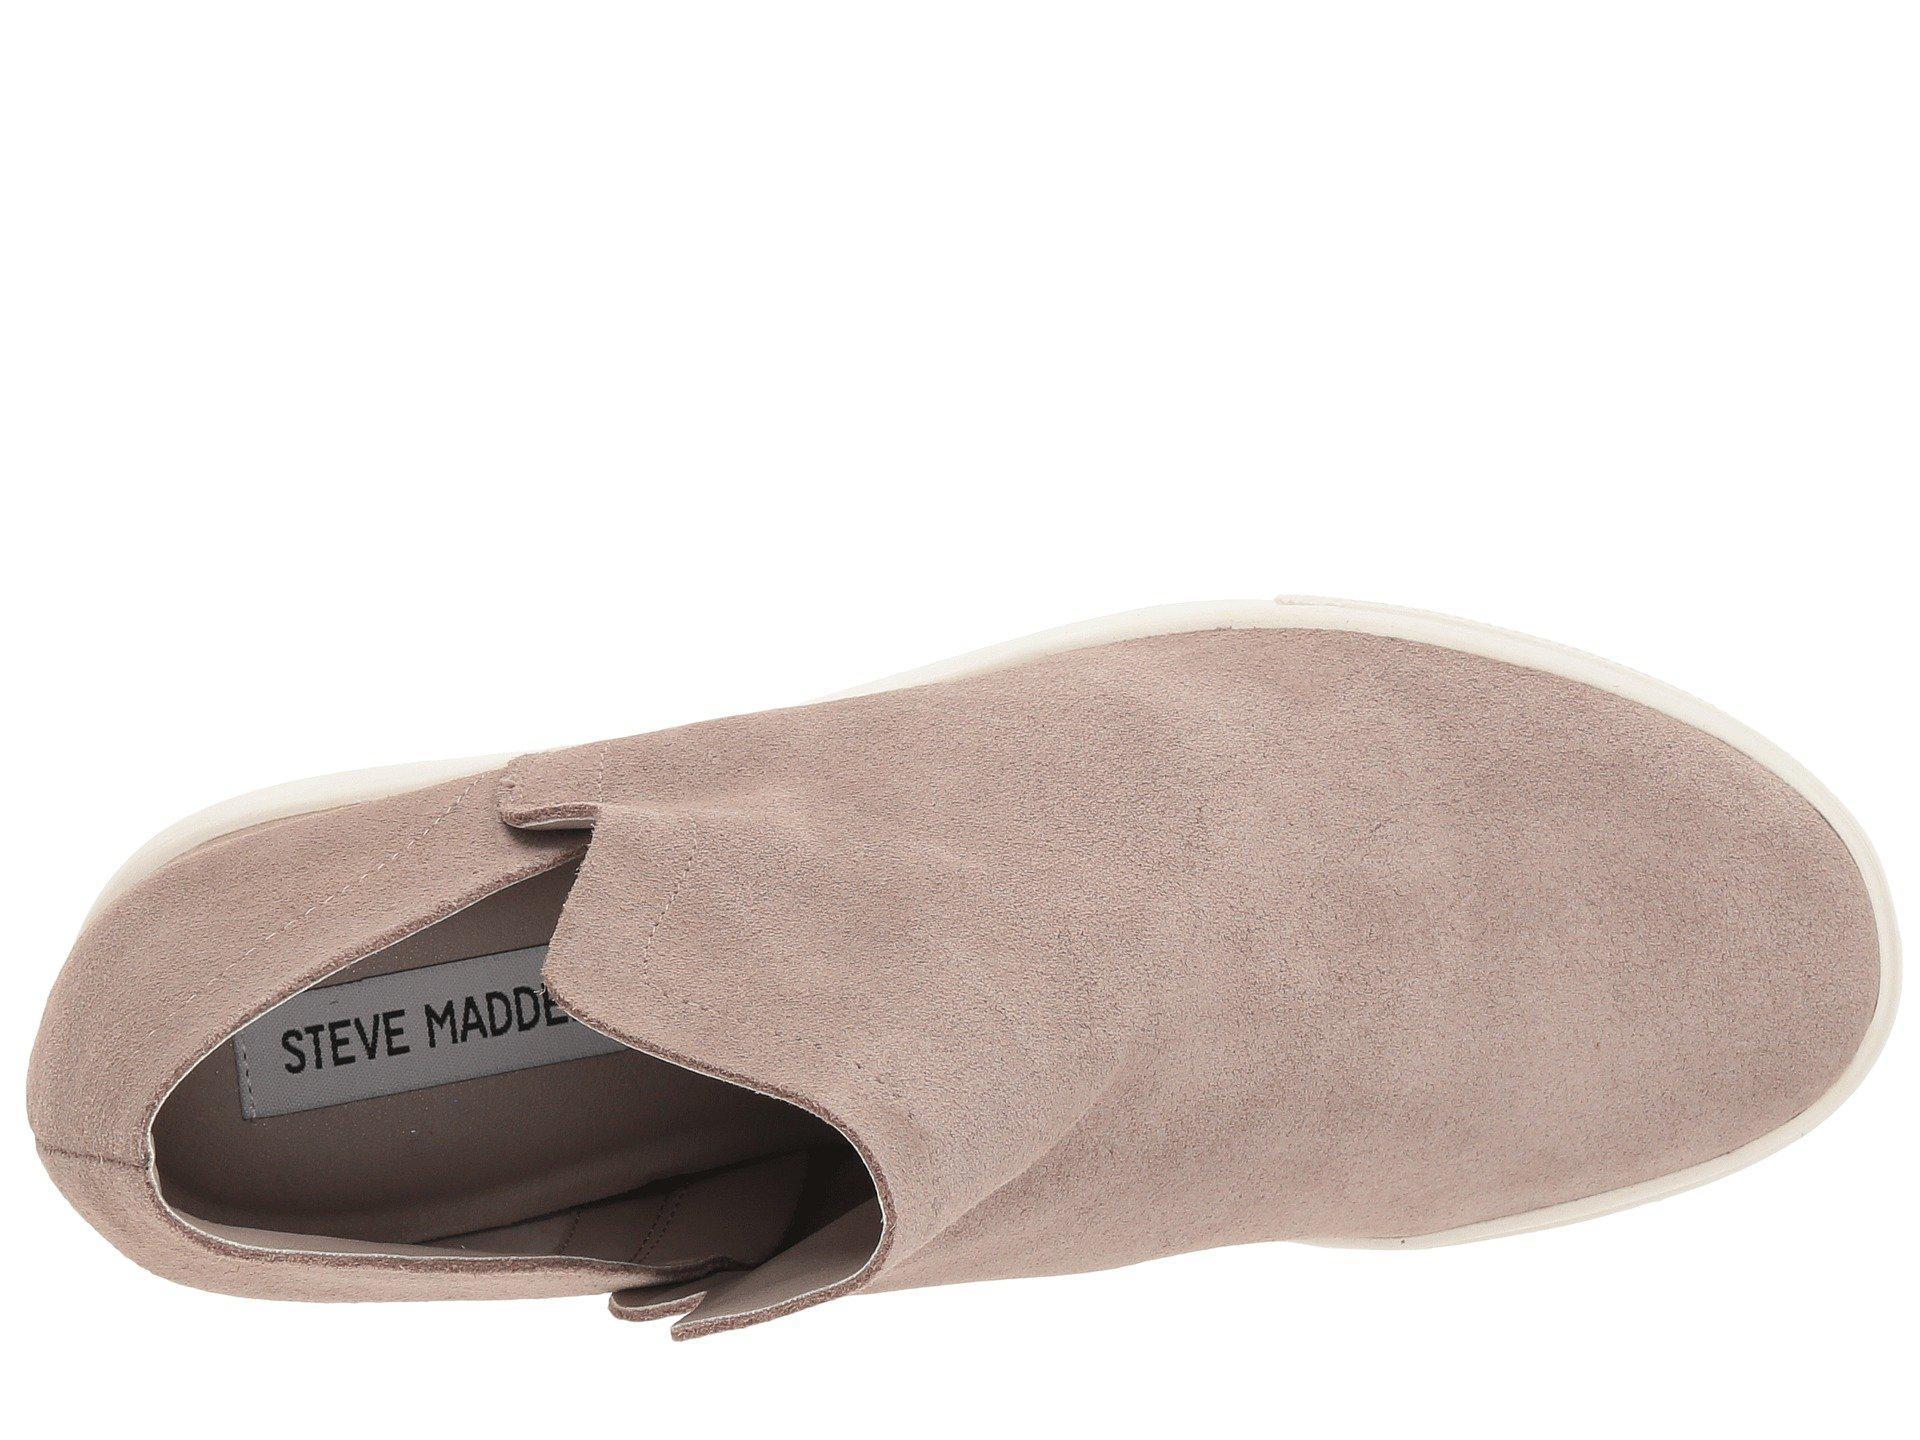 5bfc3161324 Steve Madden - Multicolor Wrangle (black Suede) Women s Shoes - Lyst. View  fullscreen